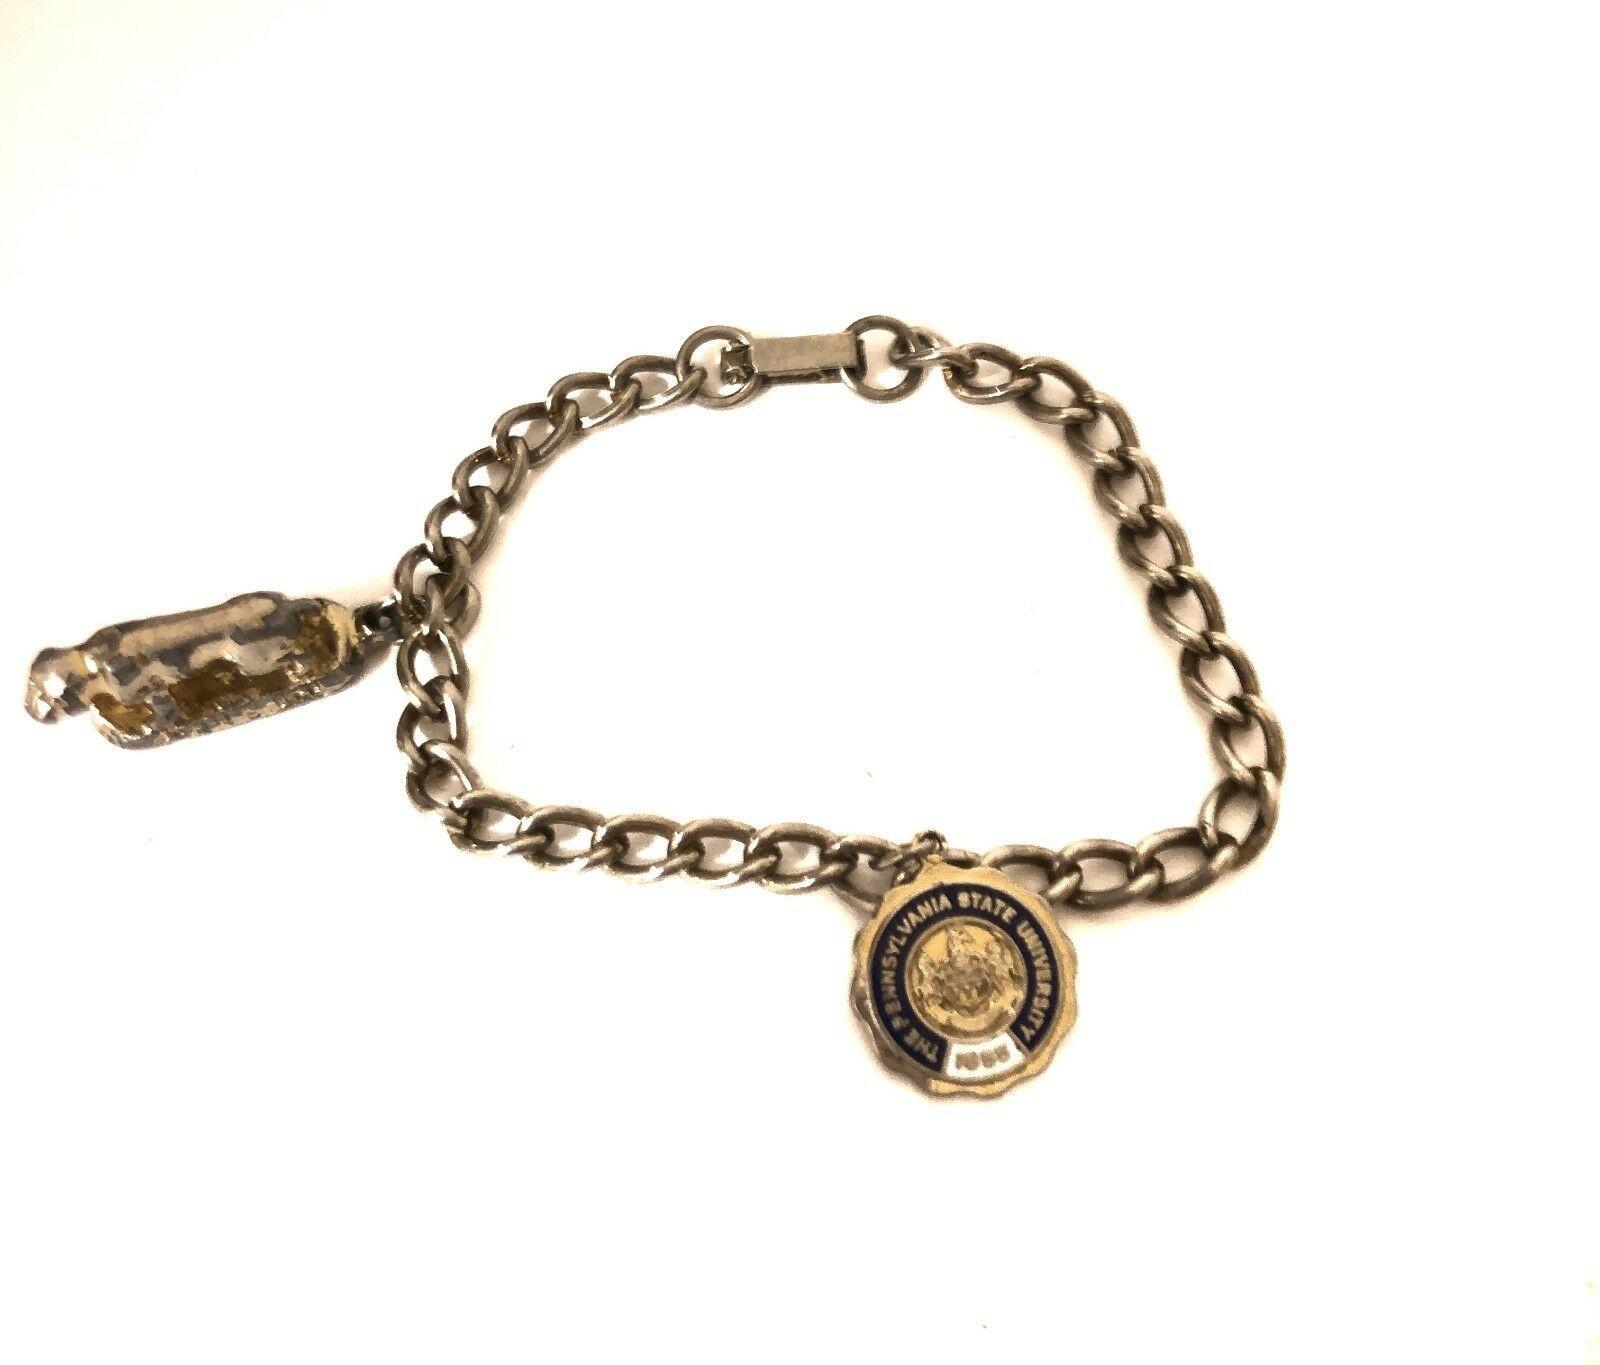 Vintage Bracelet Chain Pennsylvania State University Charm & Gold Lion Pendant